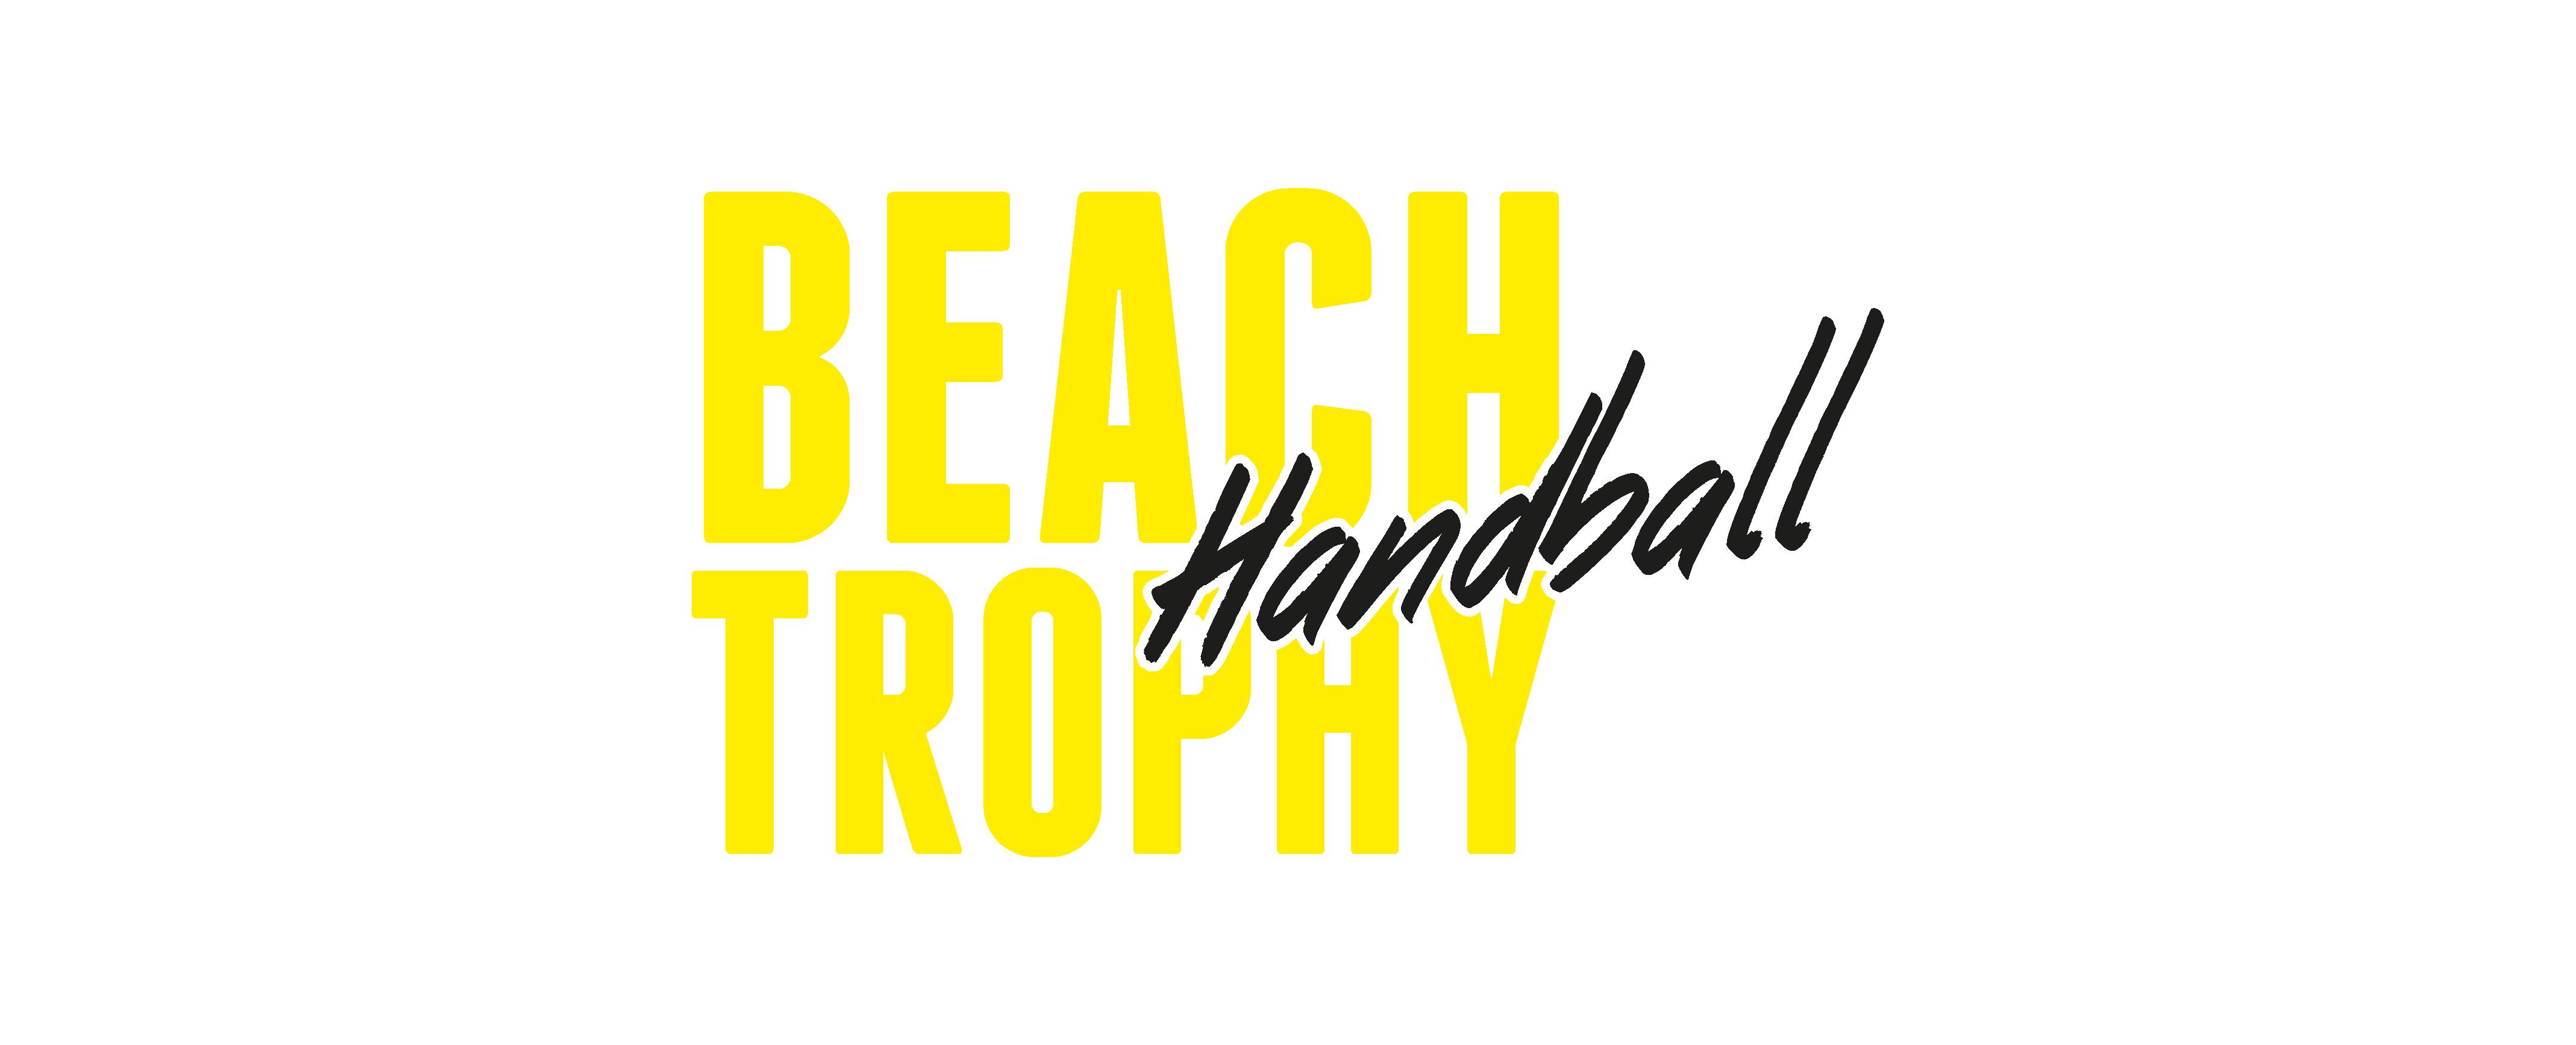 Beach Handball Trophy